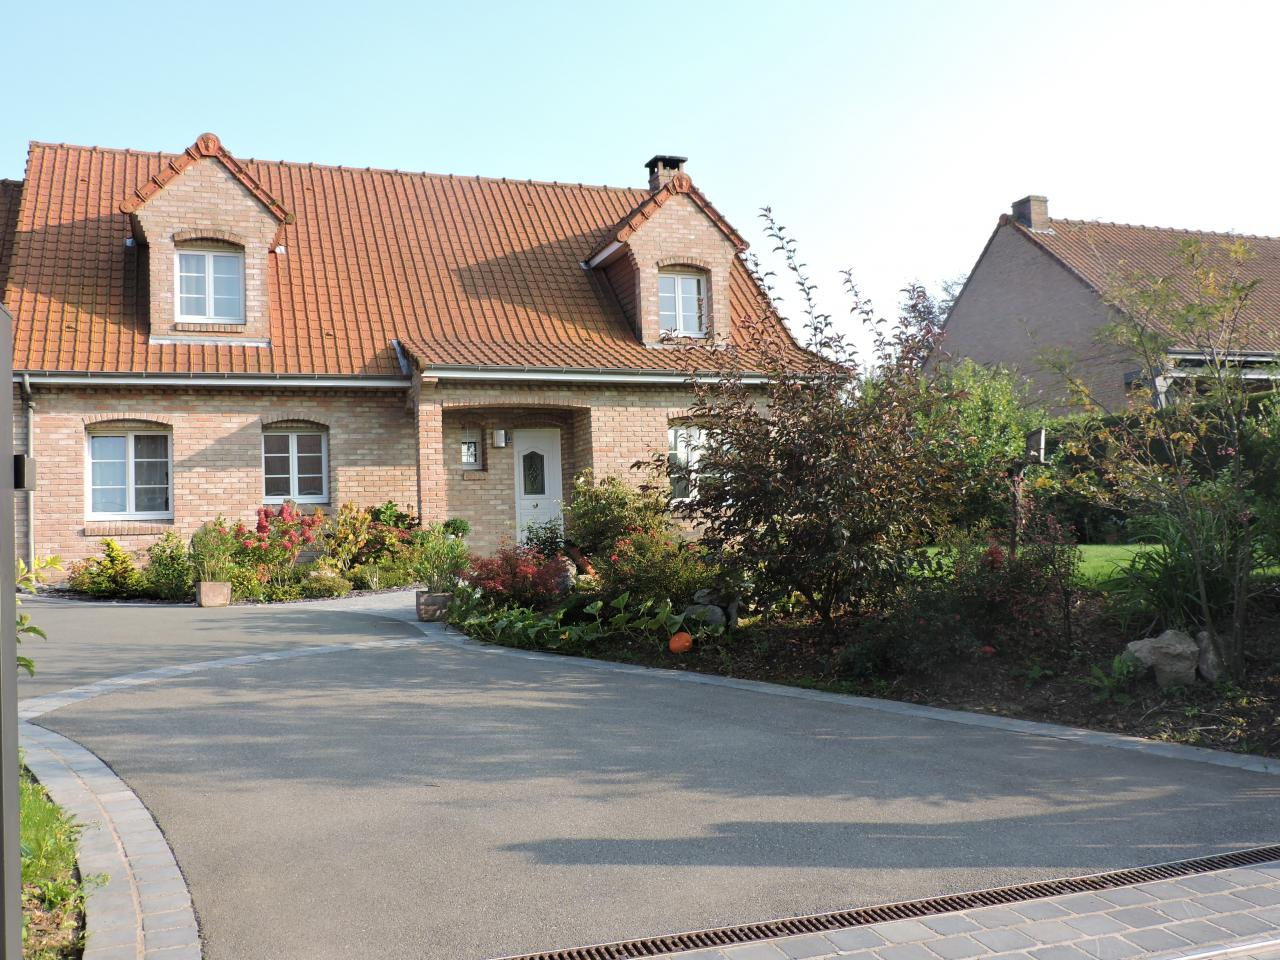 Maisons fleuries 2014 (7)